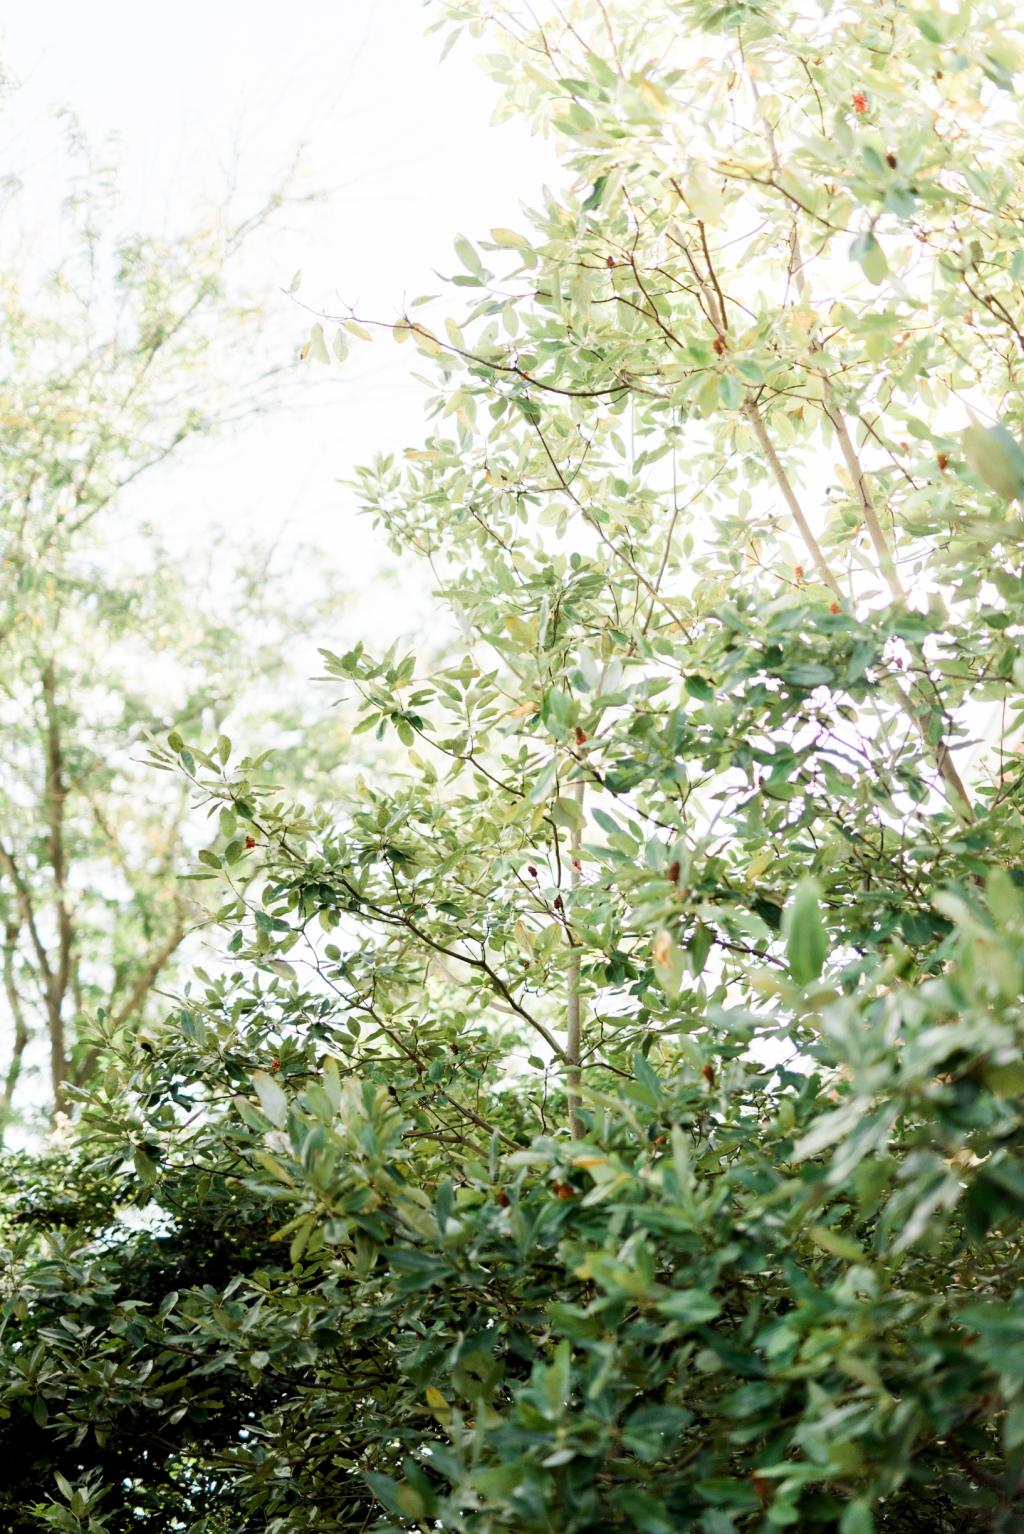 haley-richter-photography-buena-vista-confrence-center-wedding-summer-122